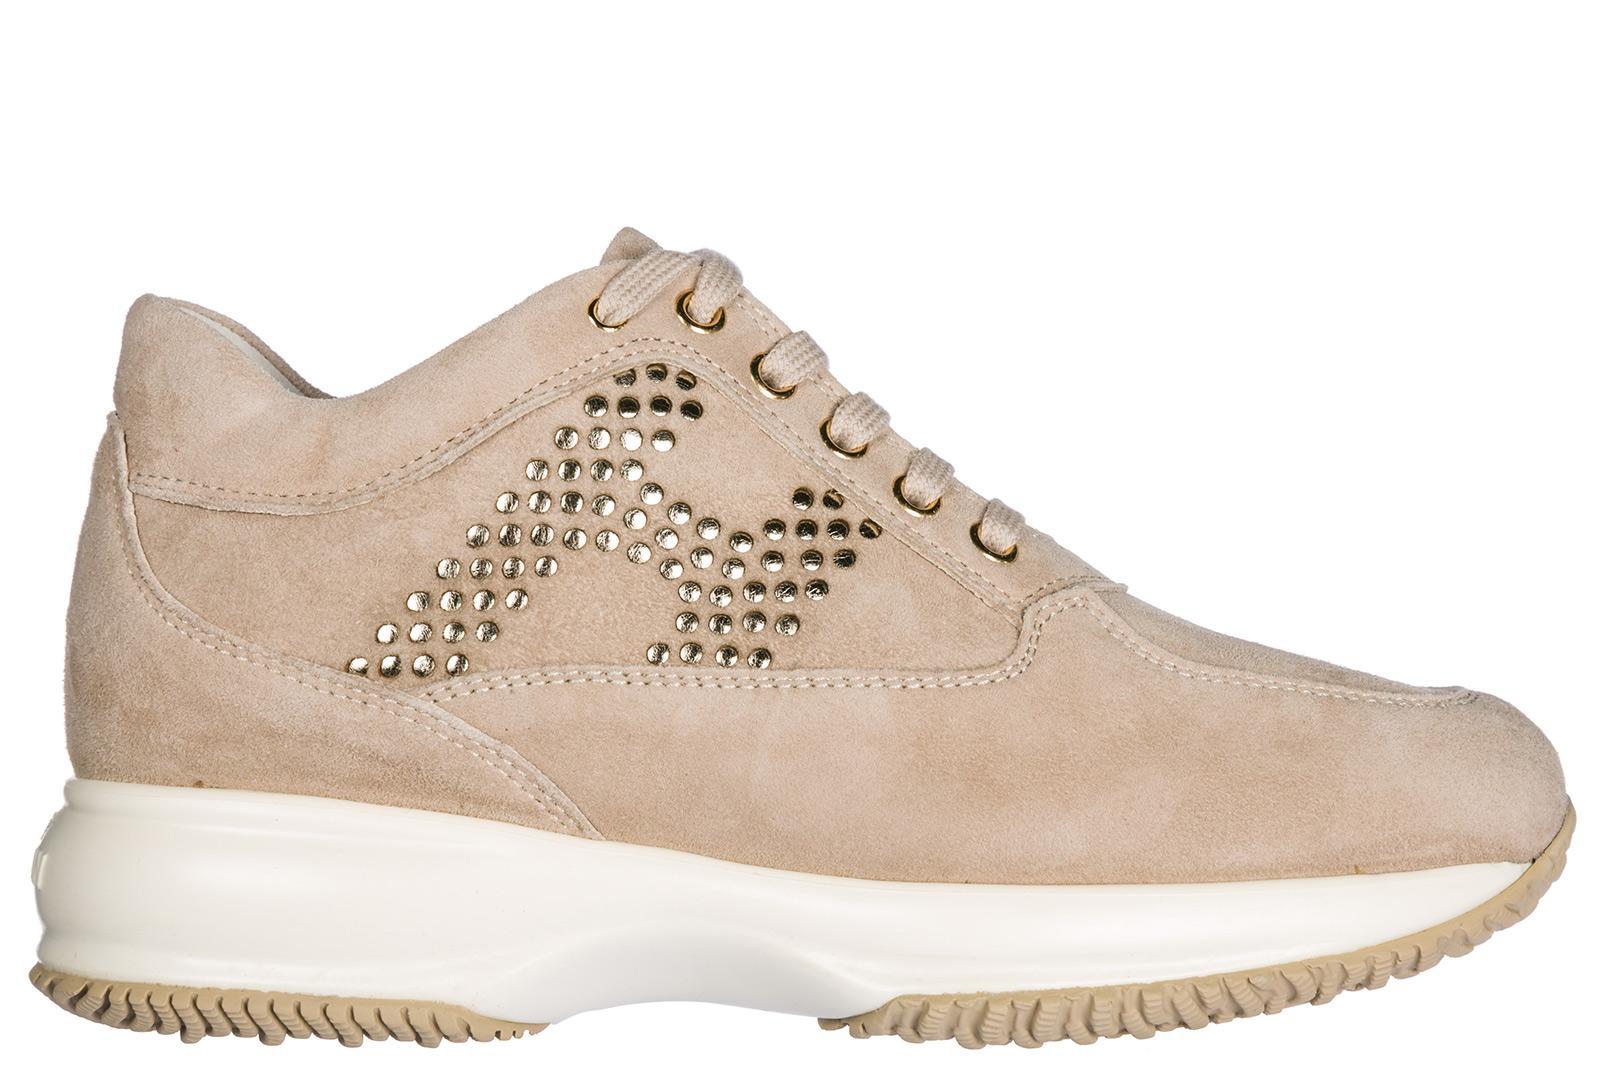 Hogan Damenschuhe Turnschuhe Damen Wildleder Schuhe Sneakers Interactive In Beige